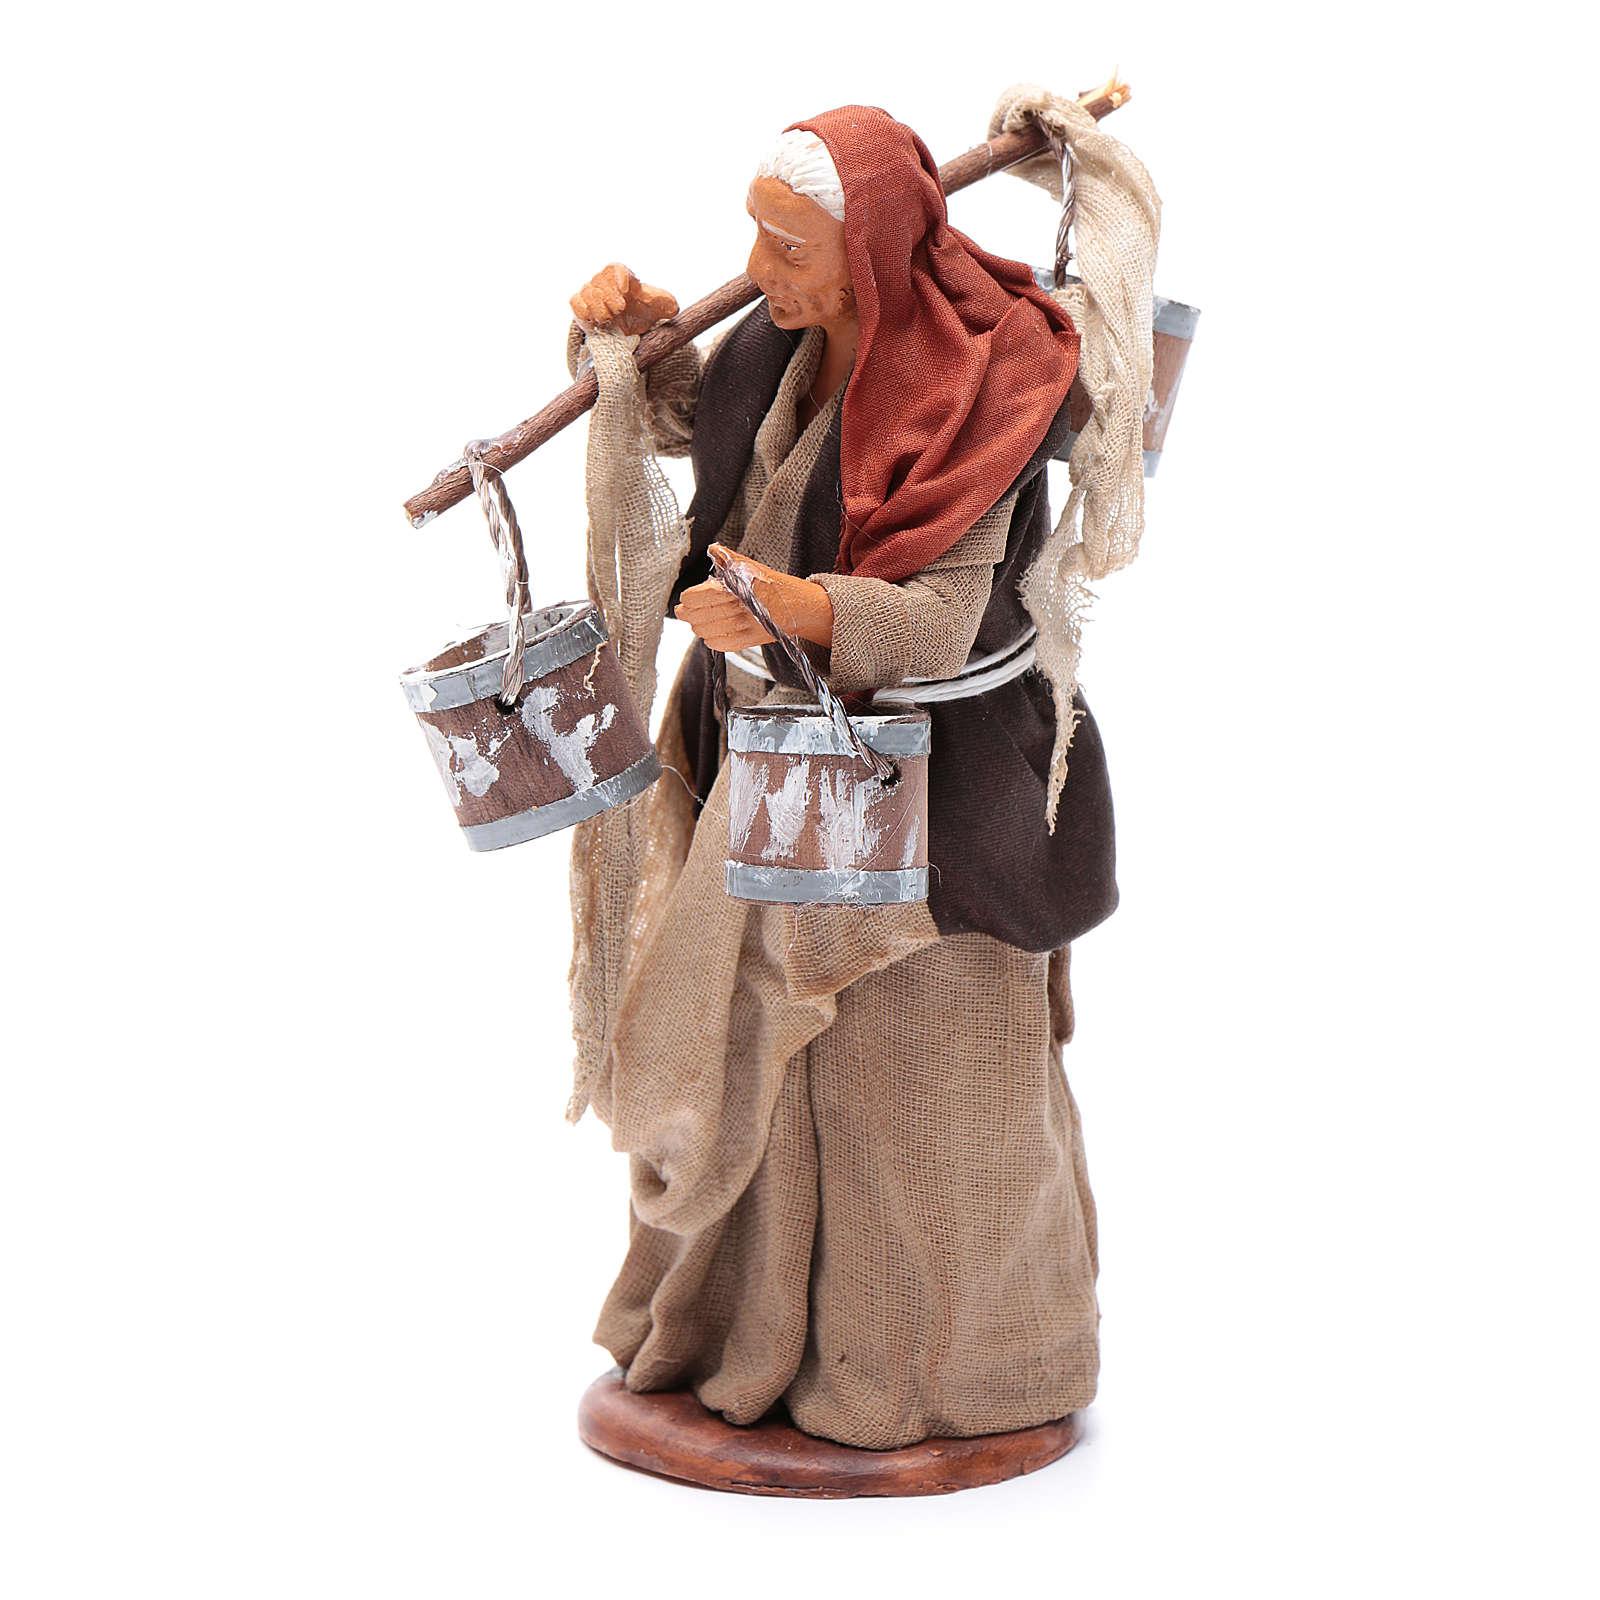 Milk seller with wooden buckets for Neapolitan Nativity, 14cm 4